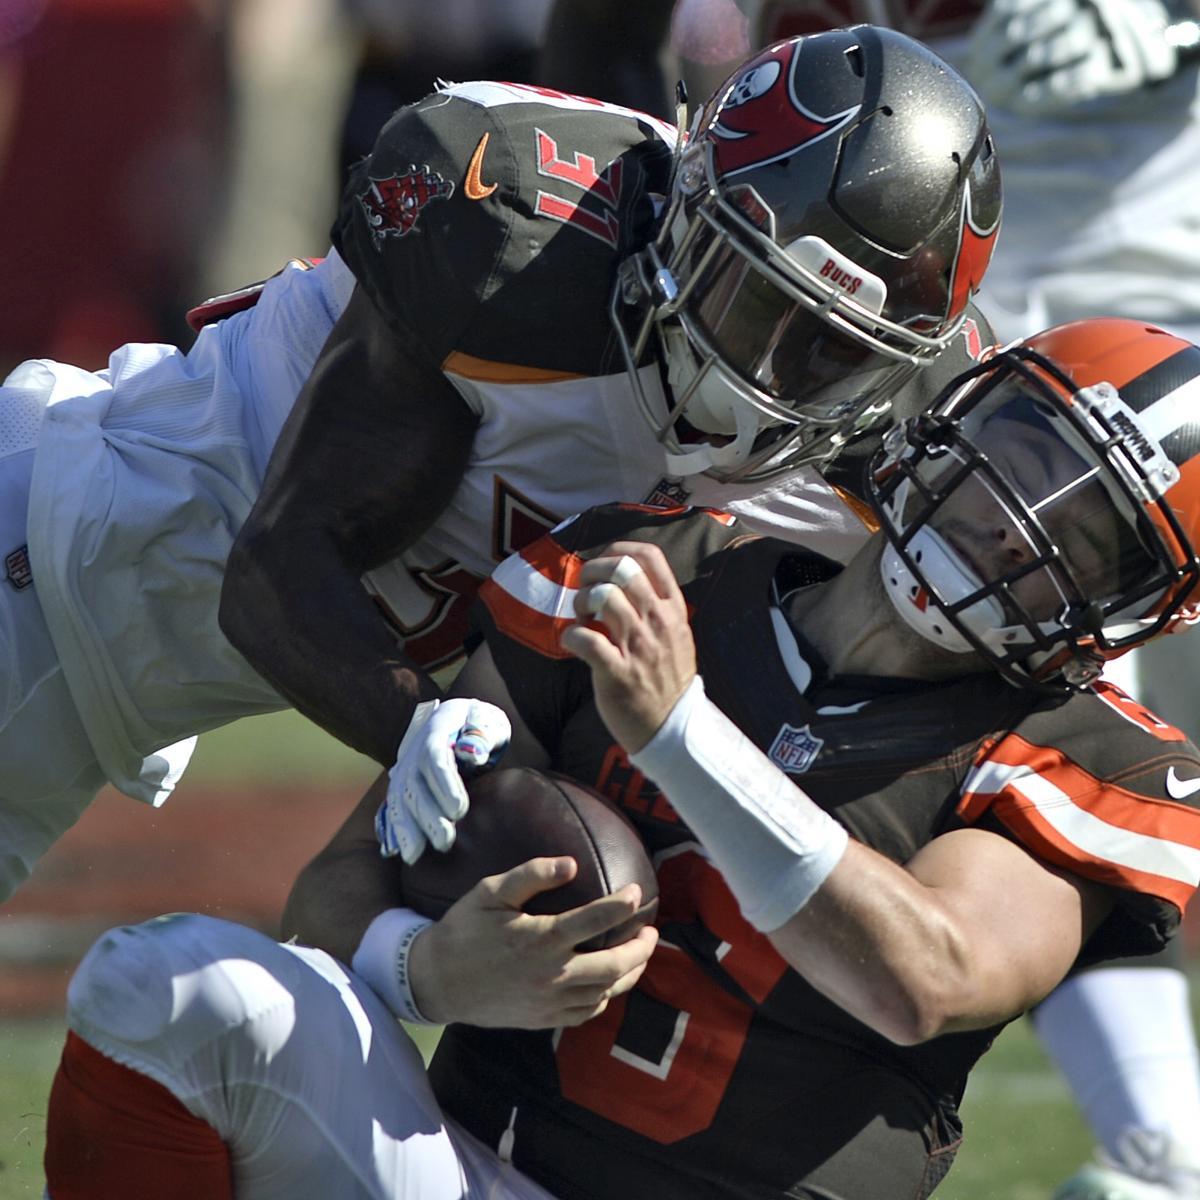 Jordan Whitehead Fined $26,739 for Helmet-to-Helmet Hit on Baker Mayfield